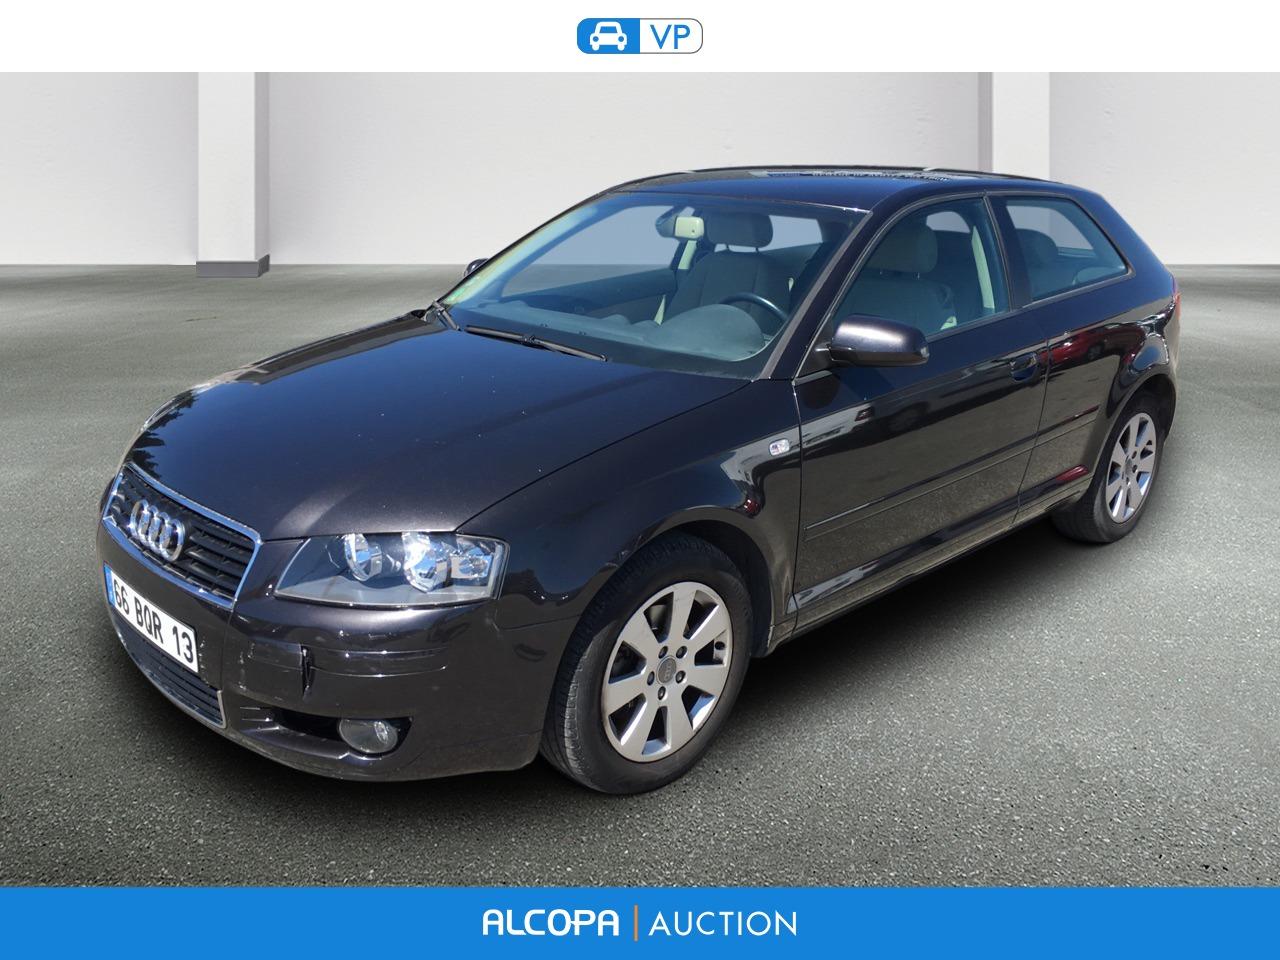 Audi A3 052005 042008 A3 20 Fsi Ambition Tiptronic A Alcopa